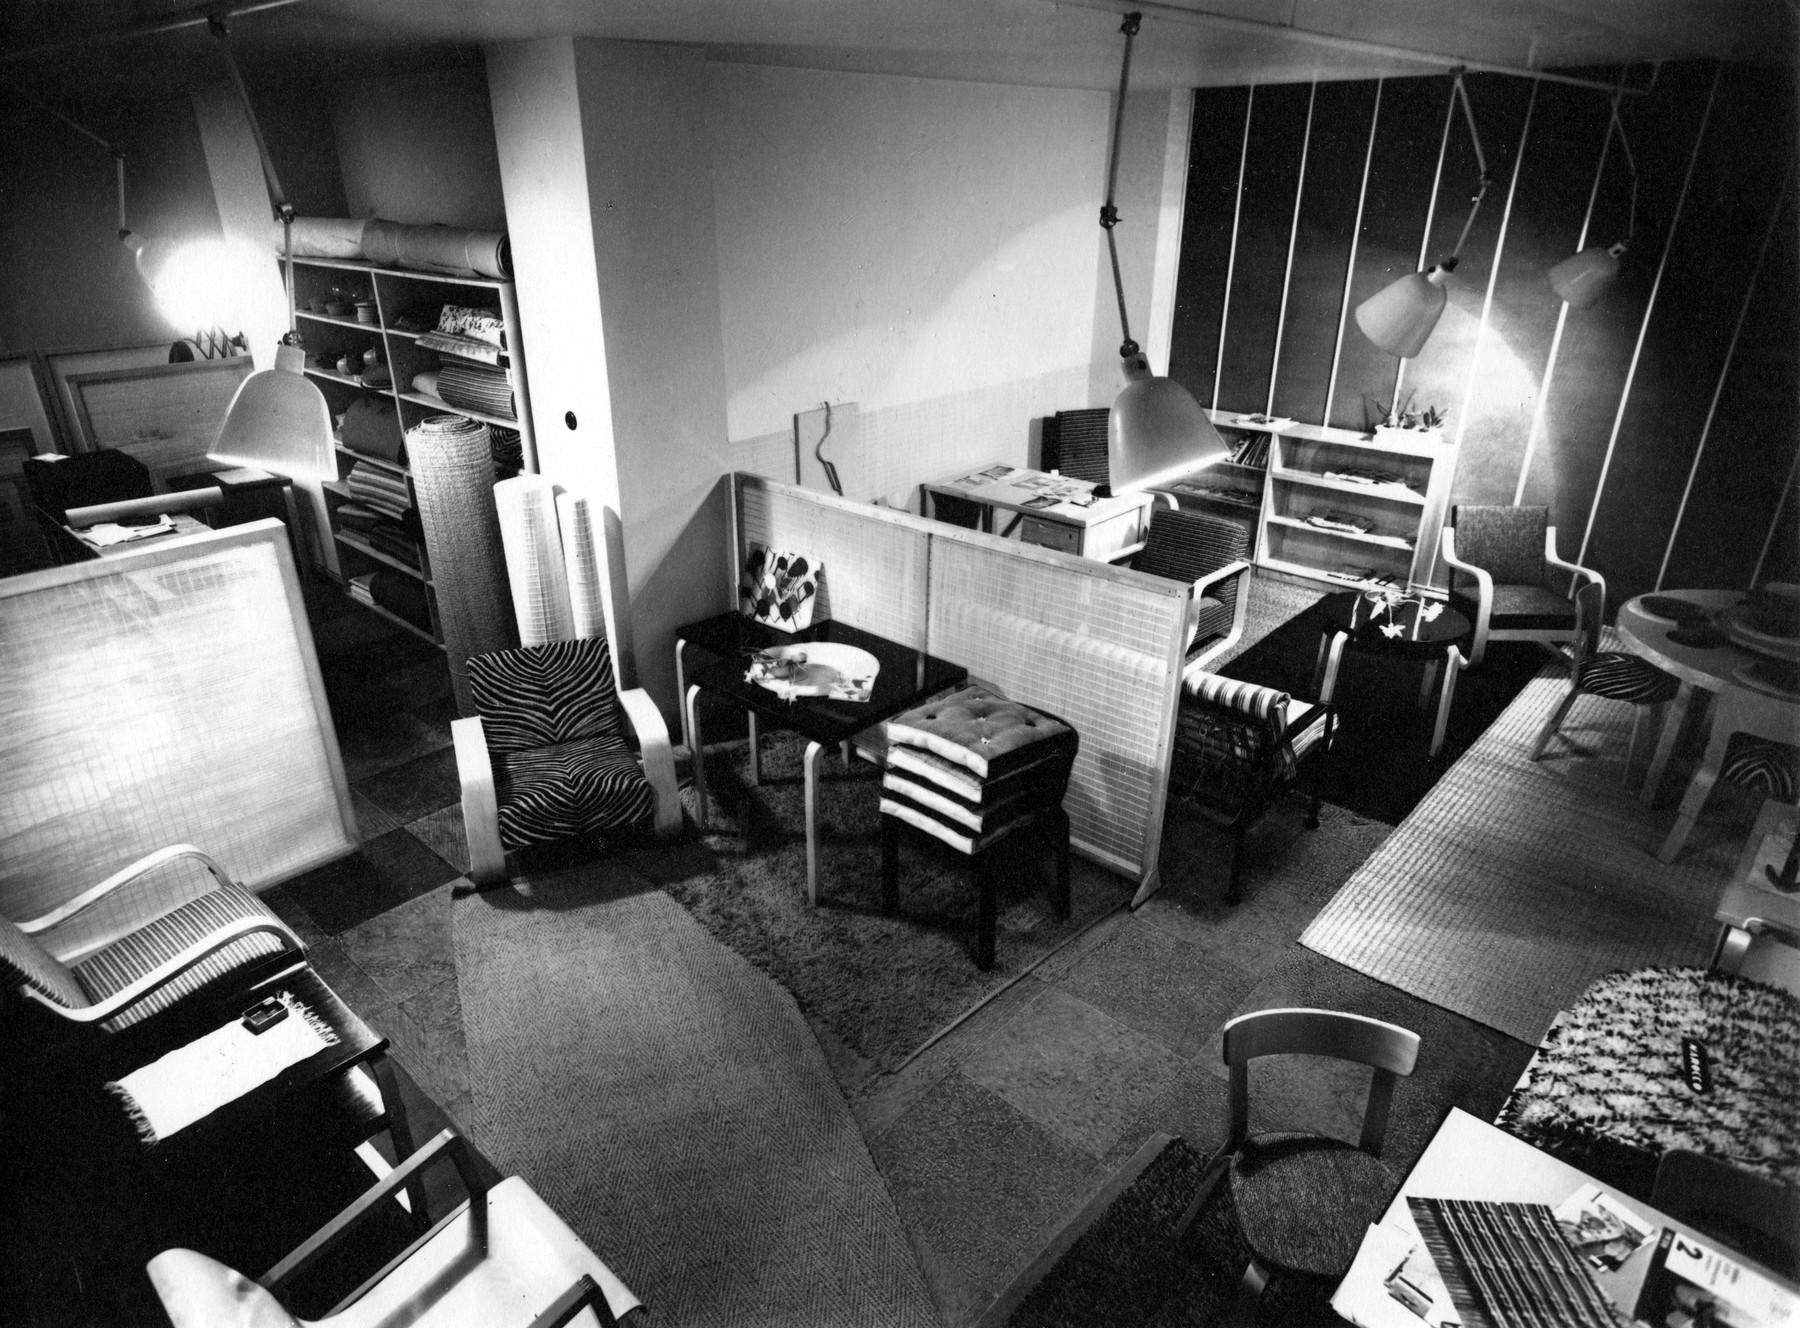 1841766 Fabianinkatu first Artek store in Helsinki 1936 master